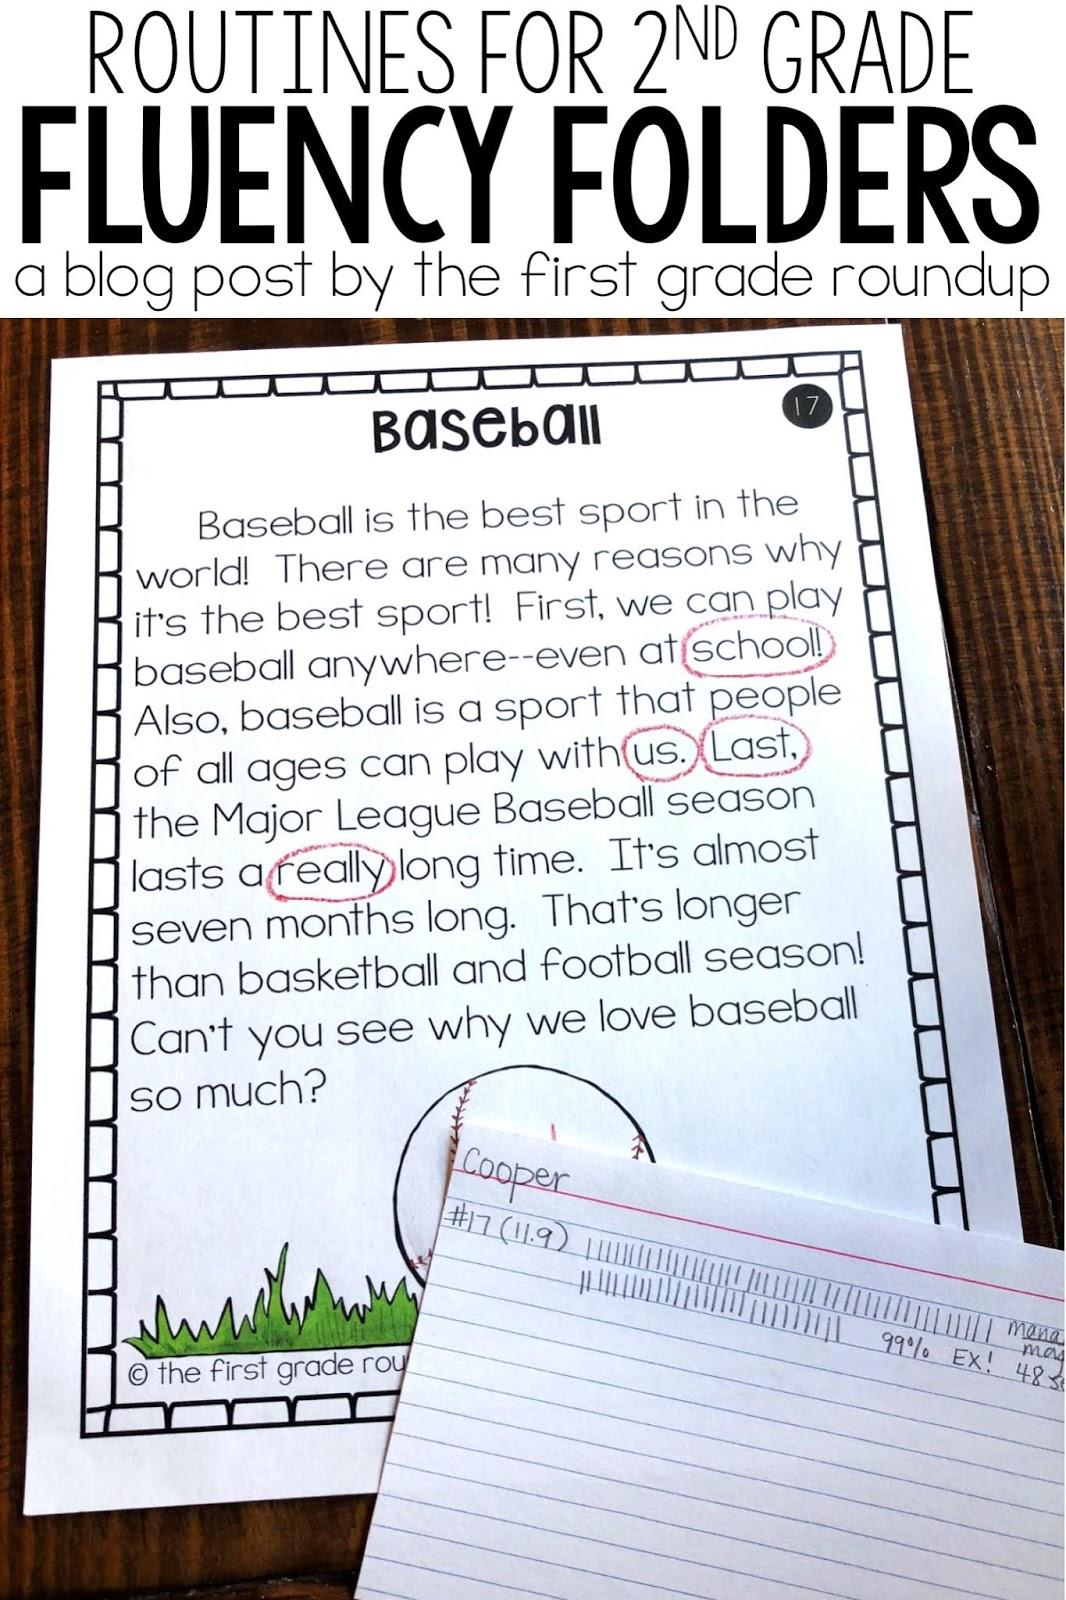 medium resolution of Fluency Folder Routines for Second Graders - Firstgraderoundup